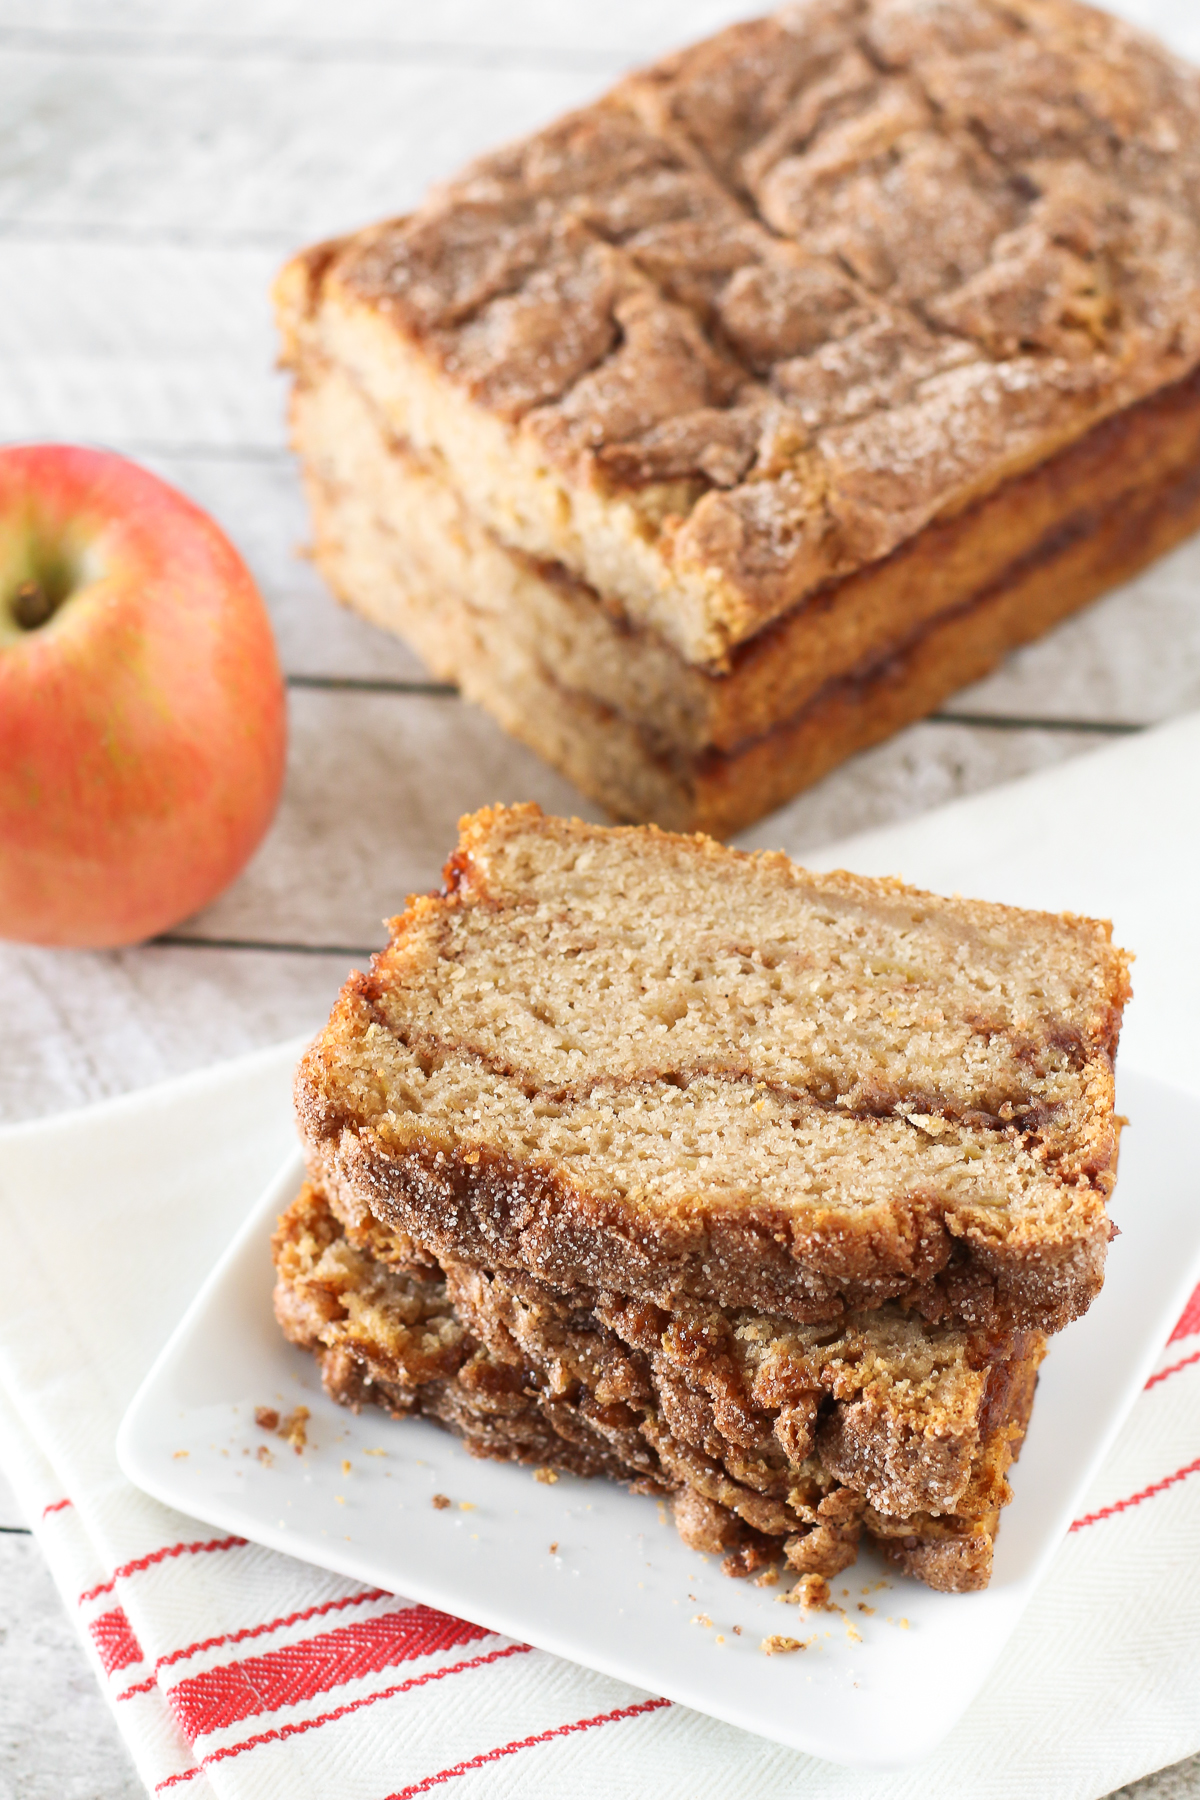 Gluten Free Vegan Apple Cinnamon Swirl Bread. Moist apple bread, with swirls of cinnamon sugar goodness.